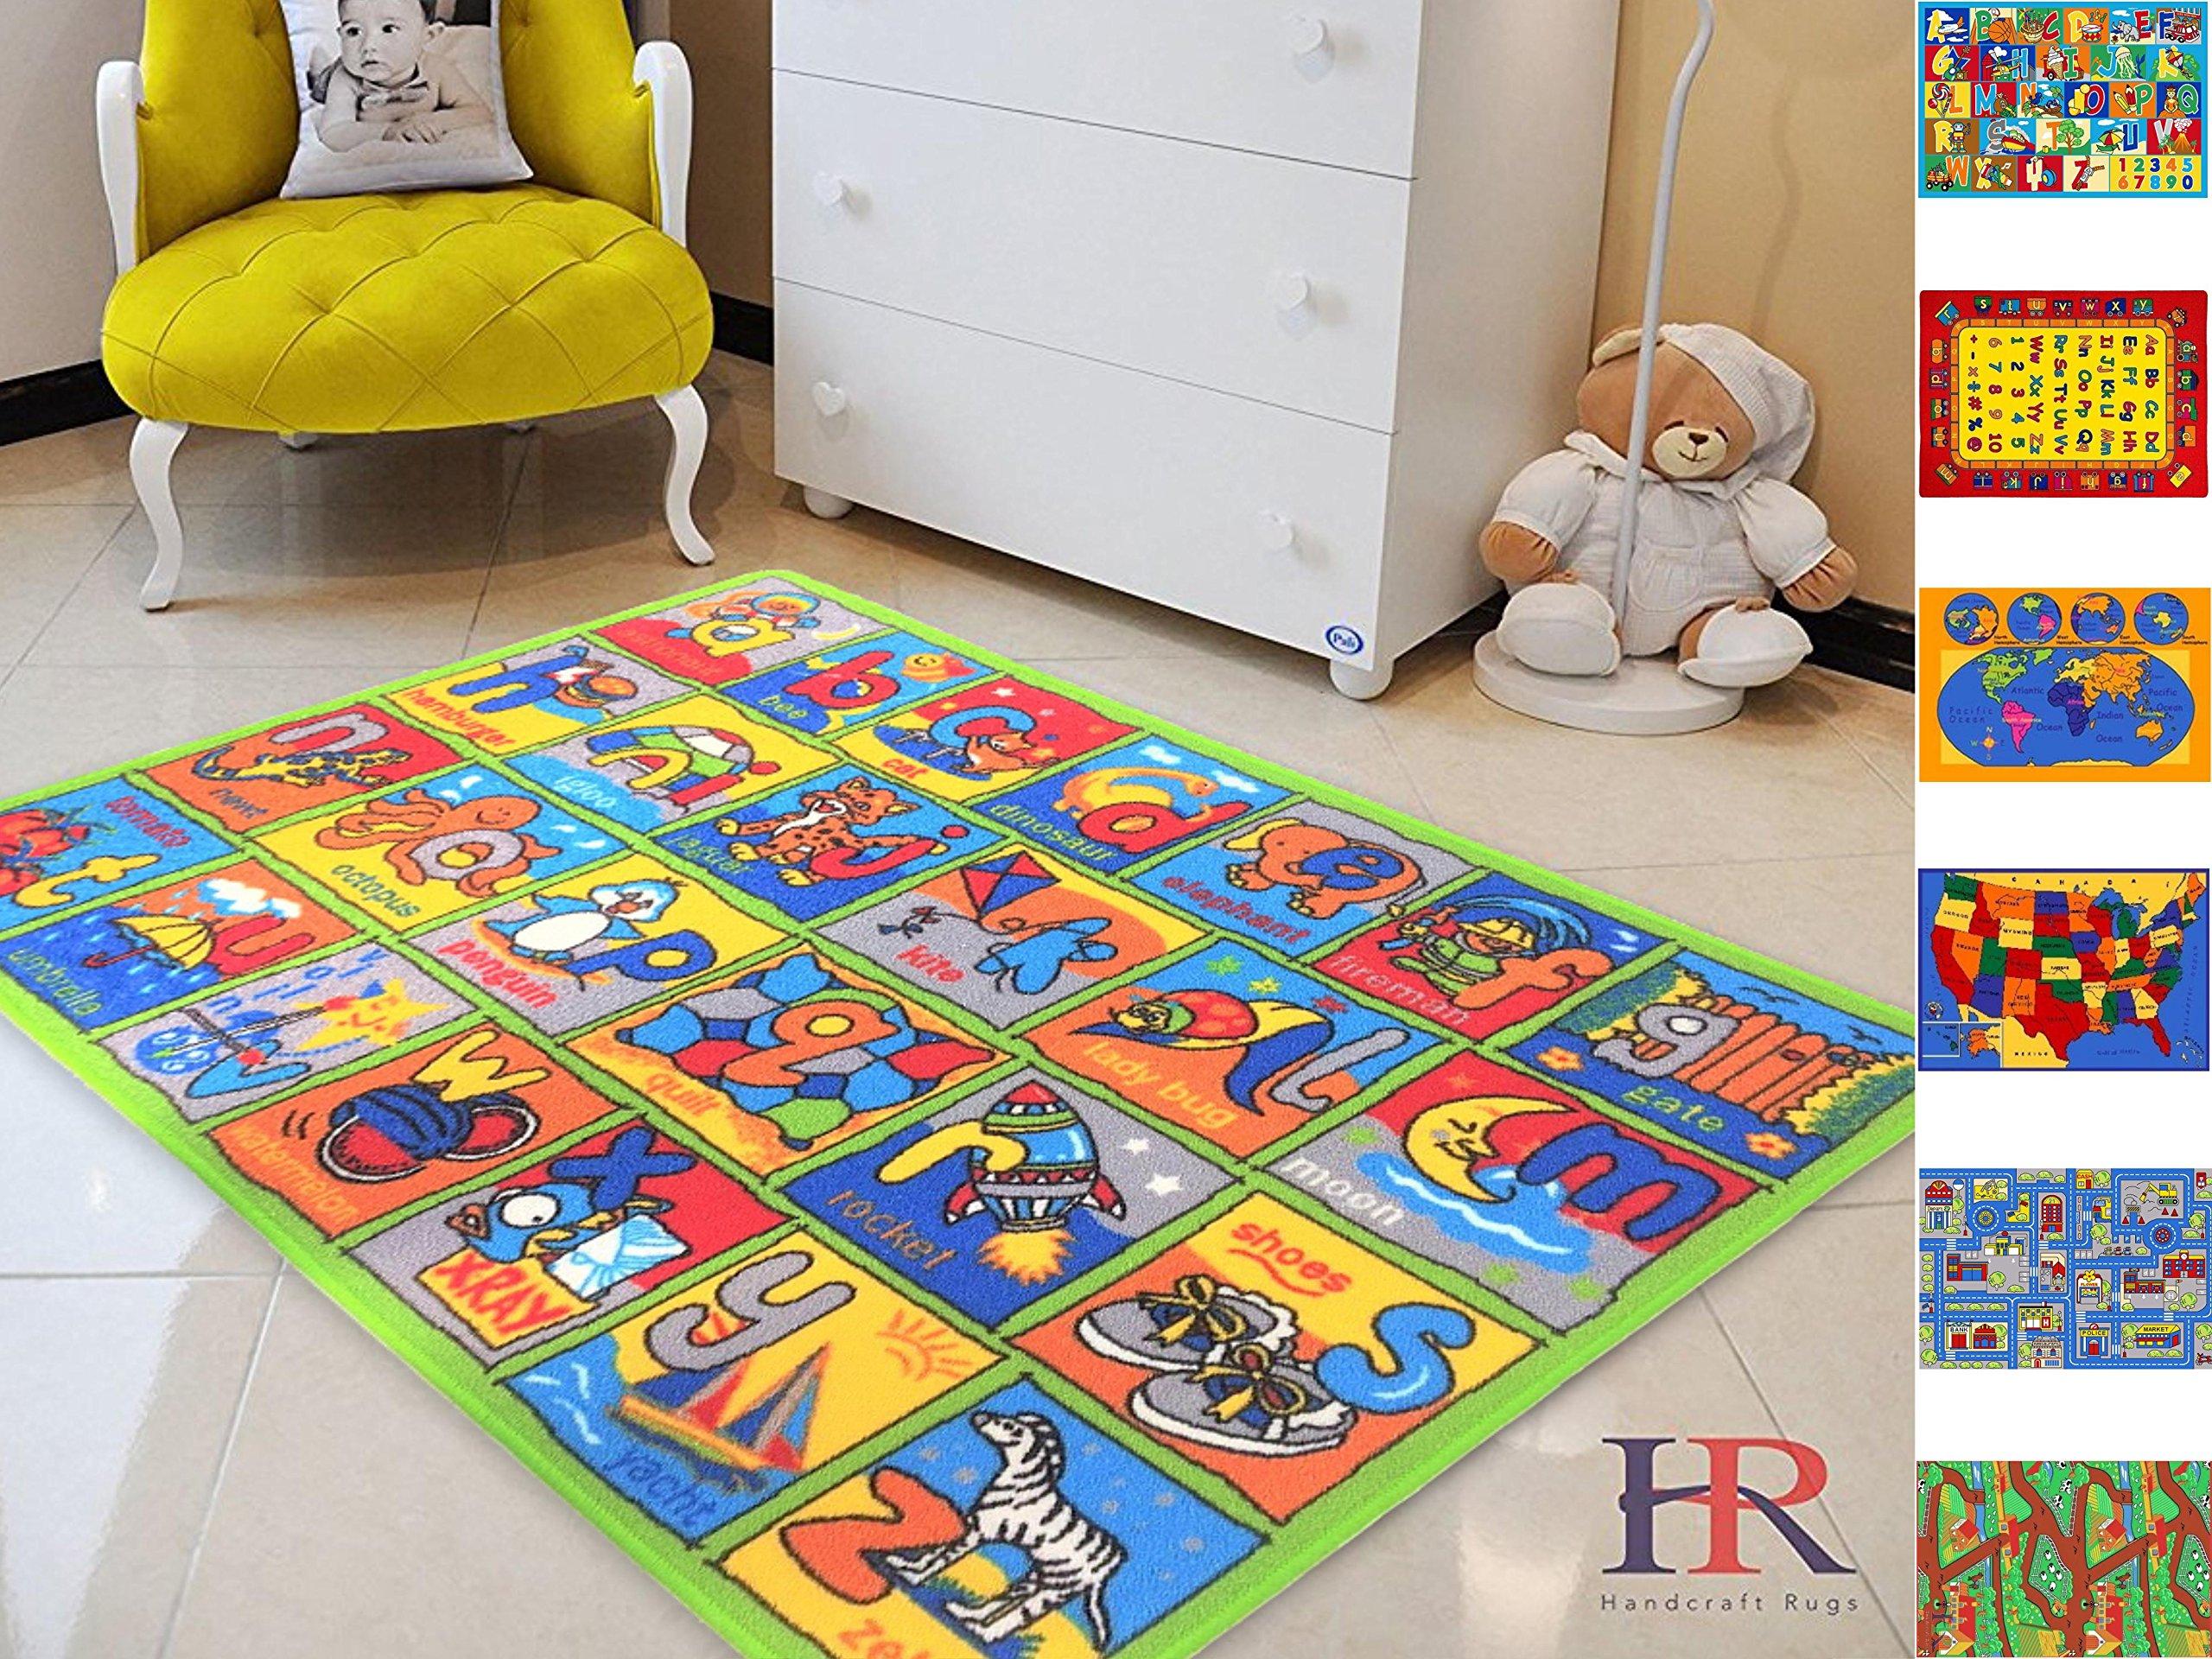 Handcraft Rugs-Game Carpets for Kids, Kids Toy, Kids learning rug, Kids Floor Rug Learning Alphabet Non-Slip / Gel Back Kids Bedroom / Classroom Carpet 8 ft. by 10 ft.